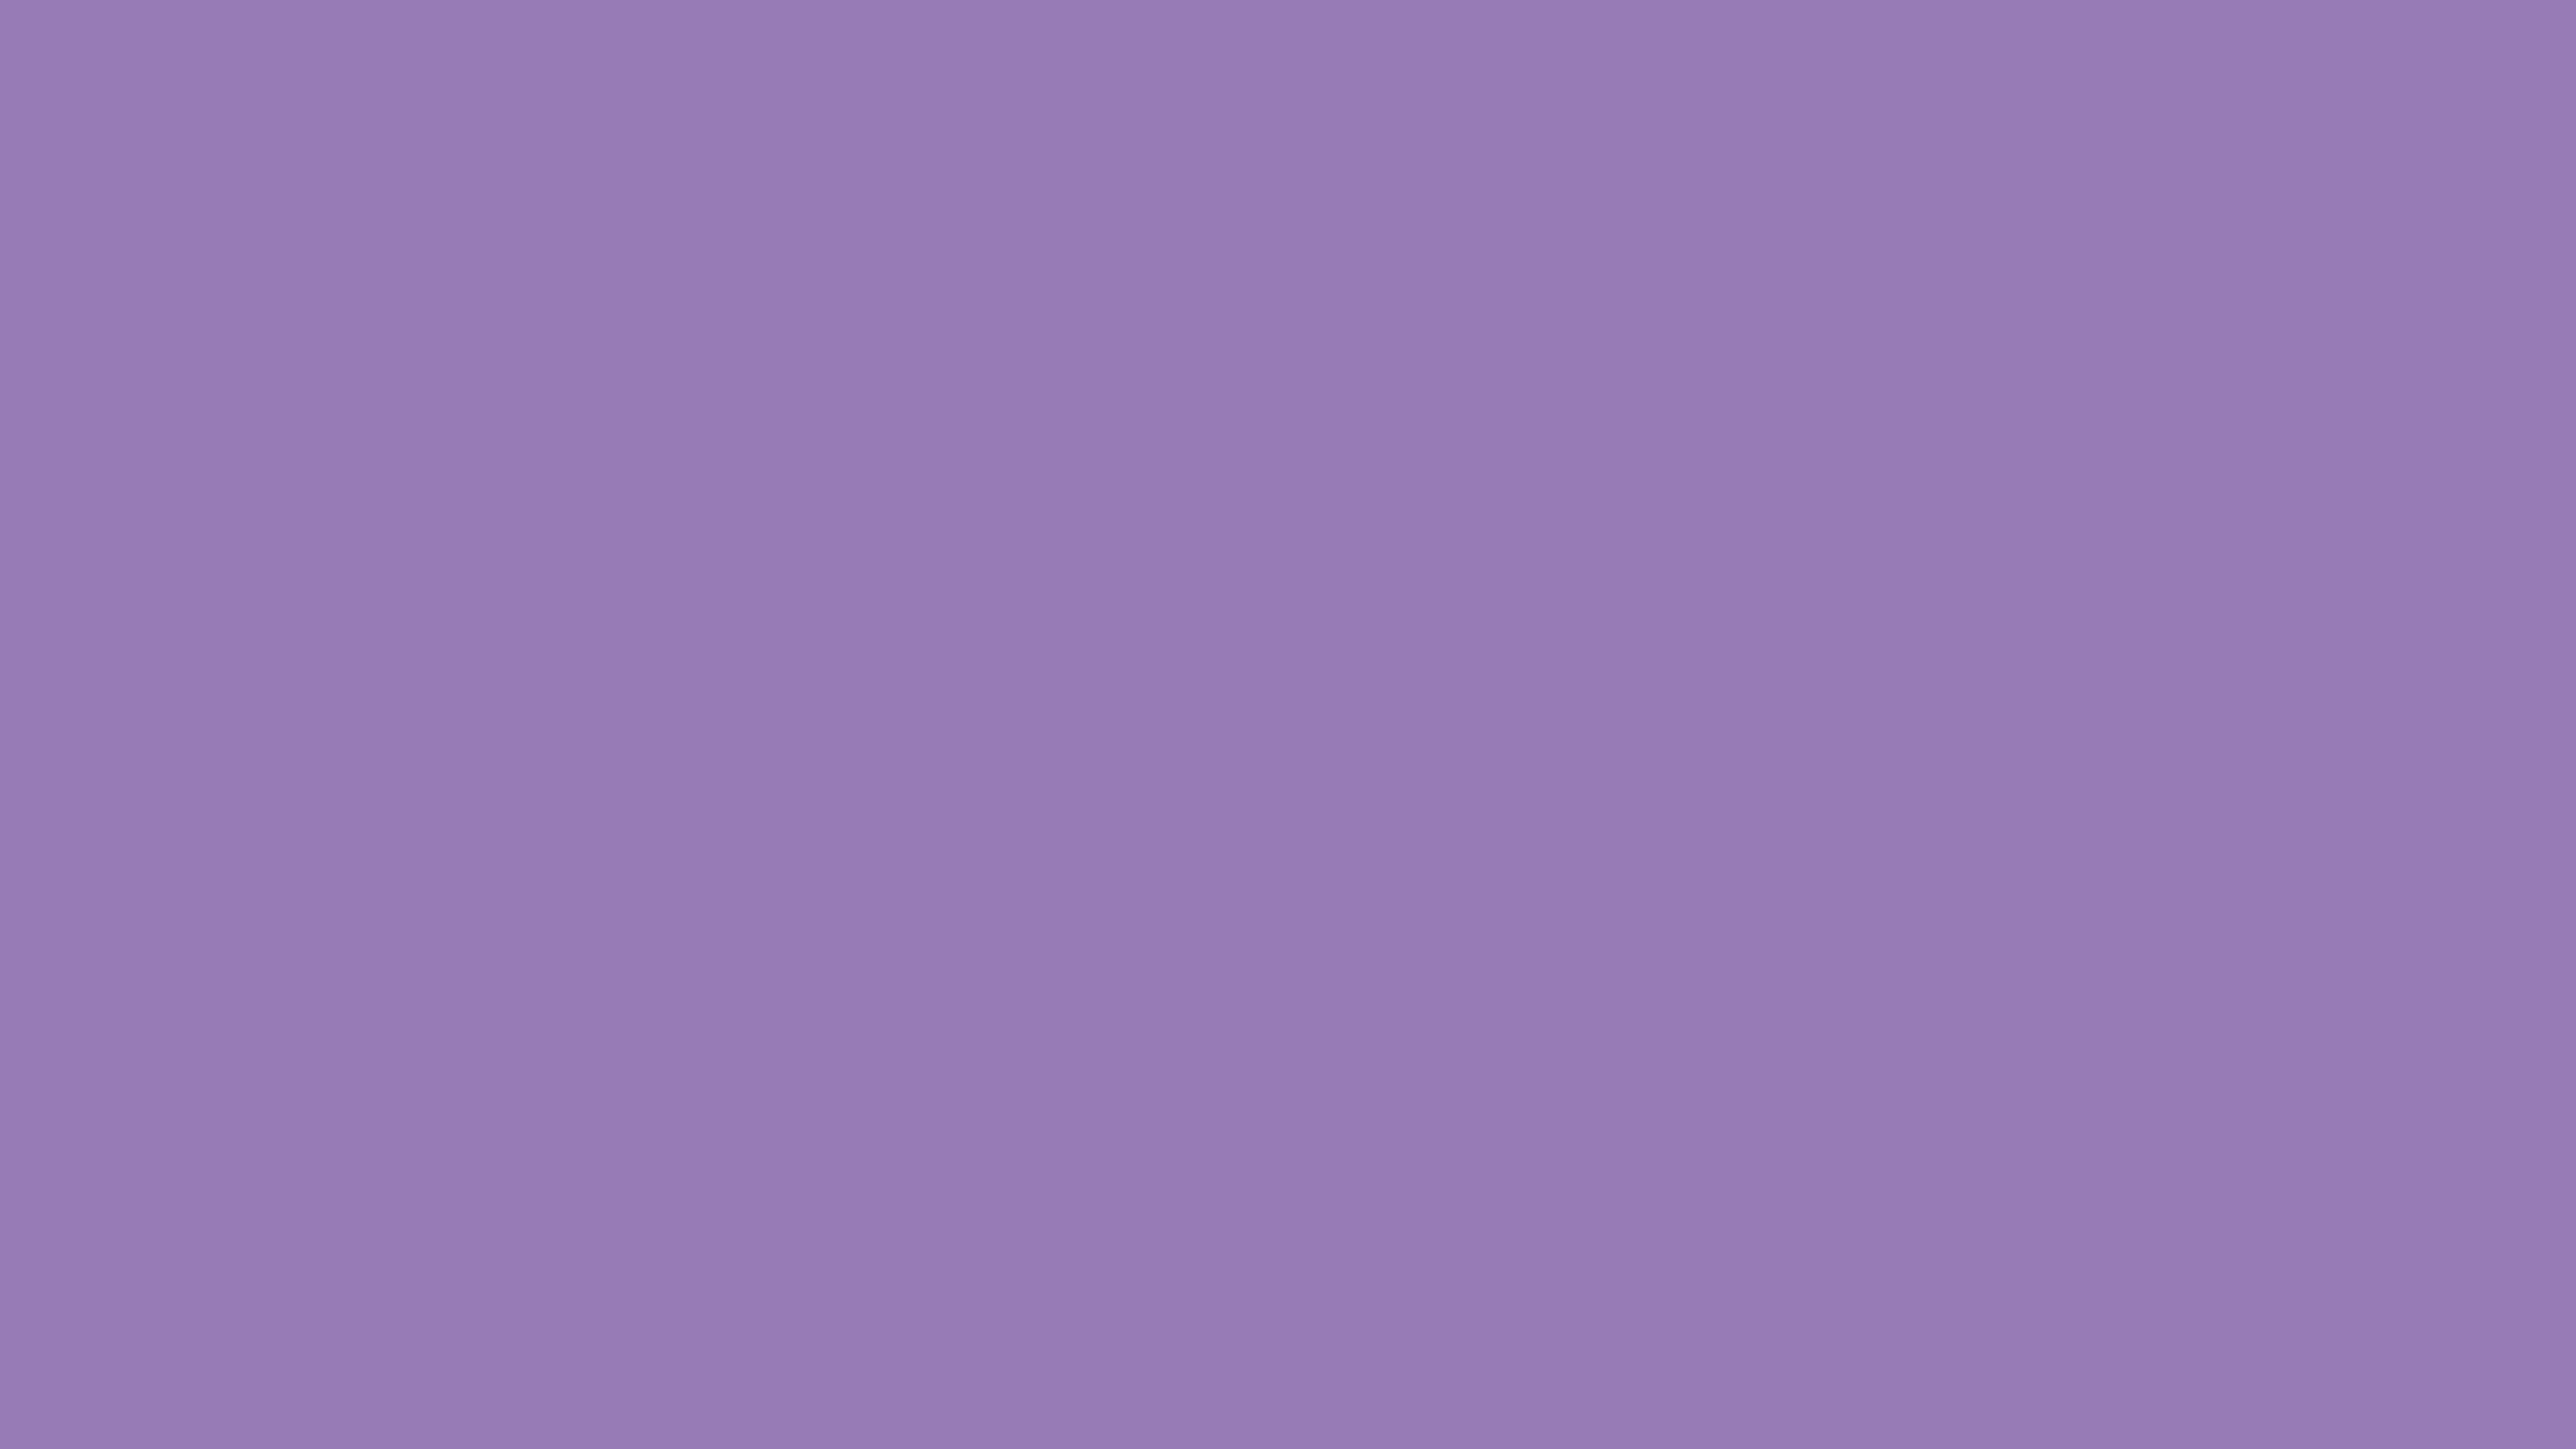 5120x2880 Lavender Purple Solid Color Background